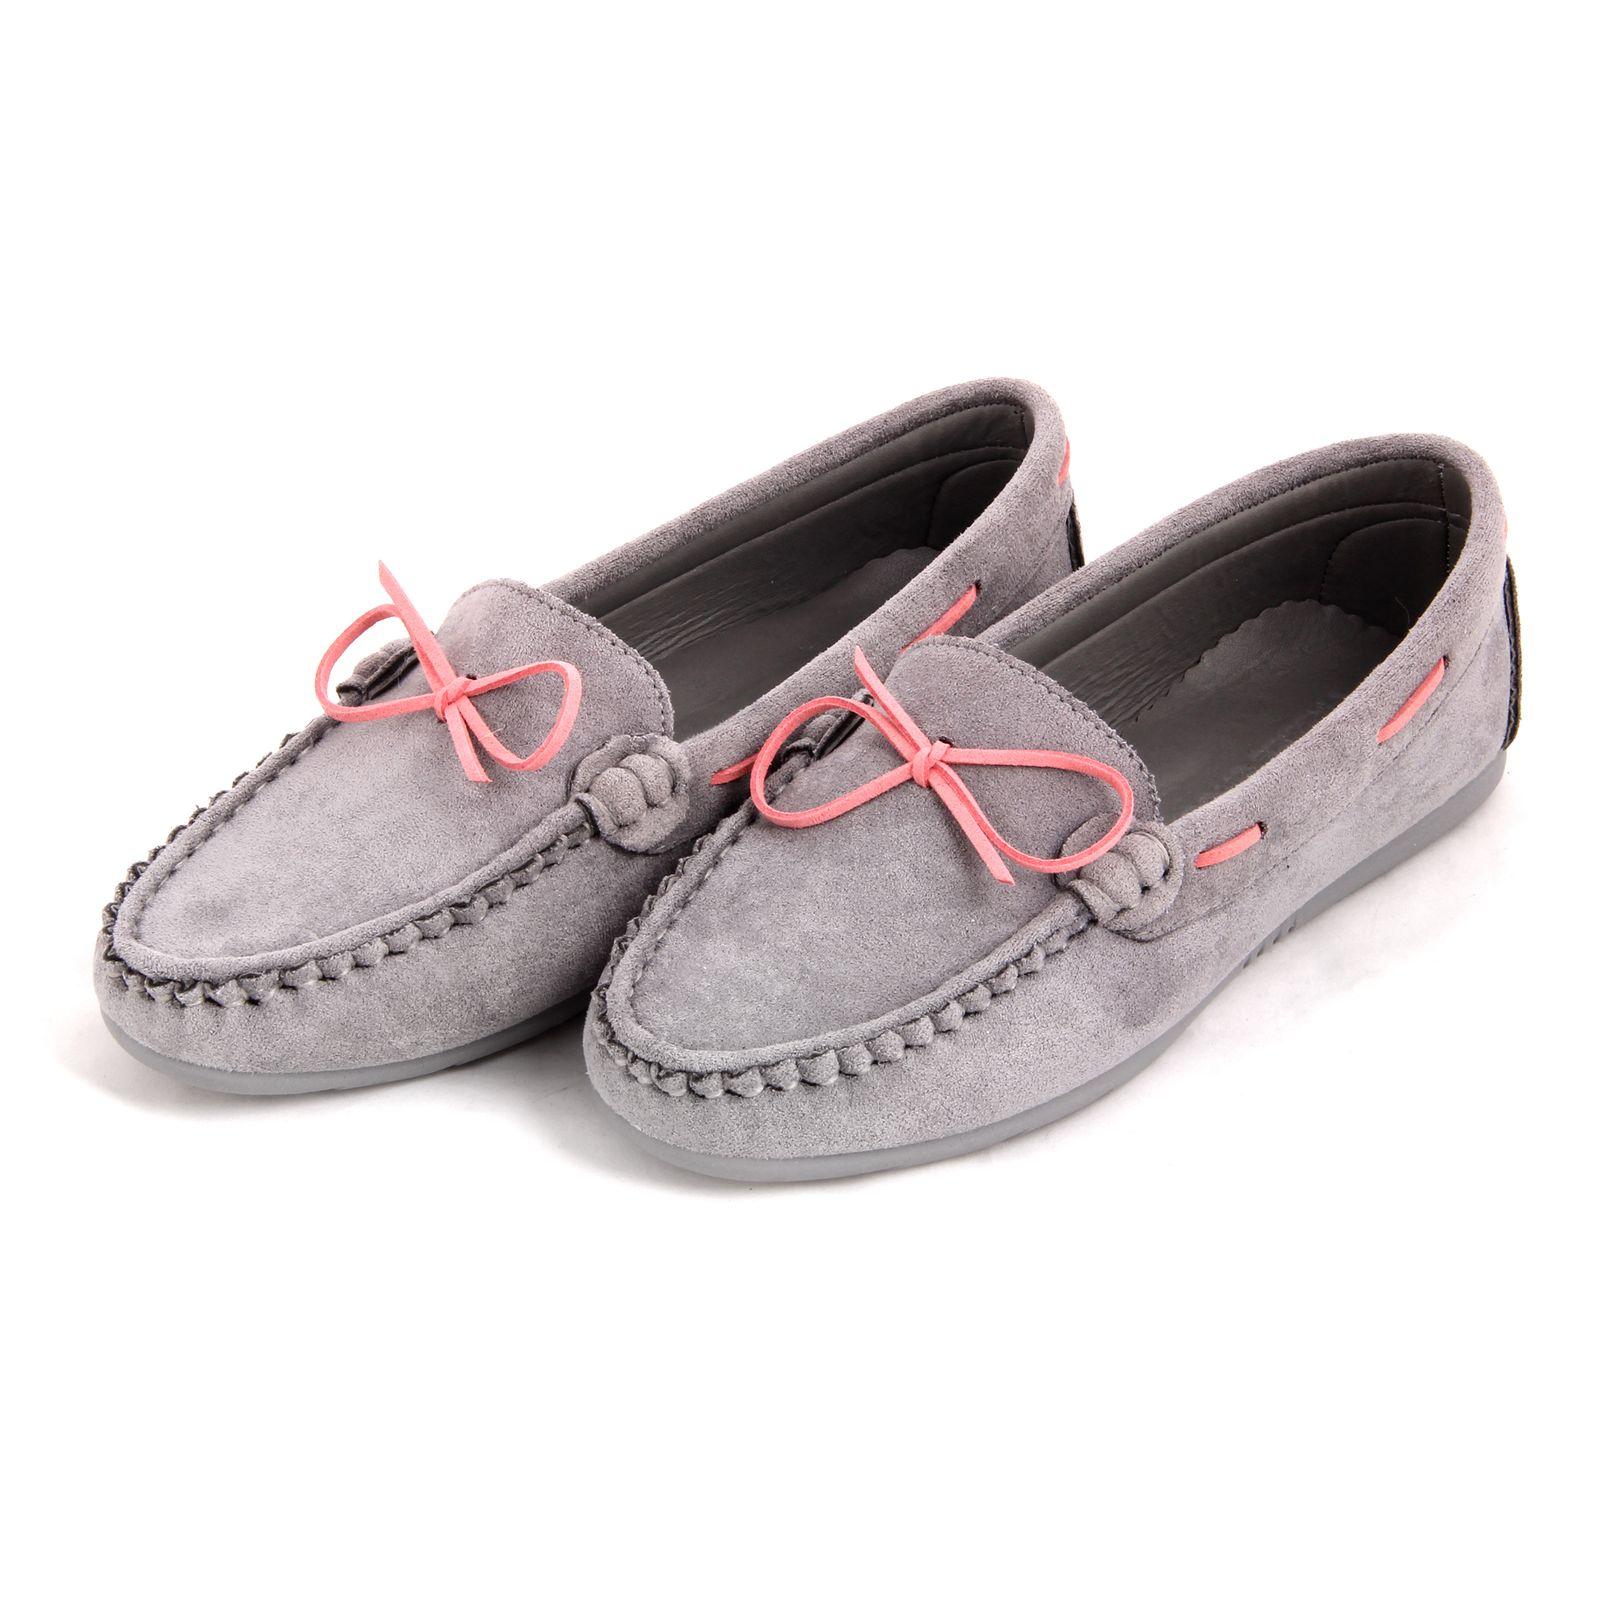 کفش روزمره زنانه کد 395 main 1 1